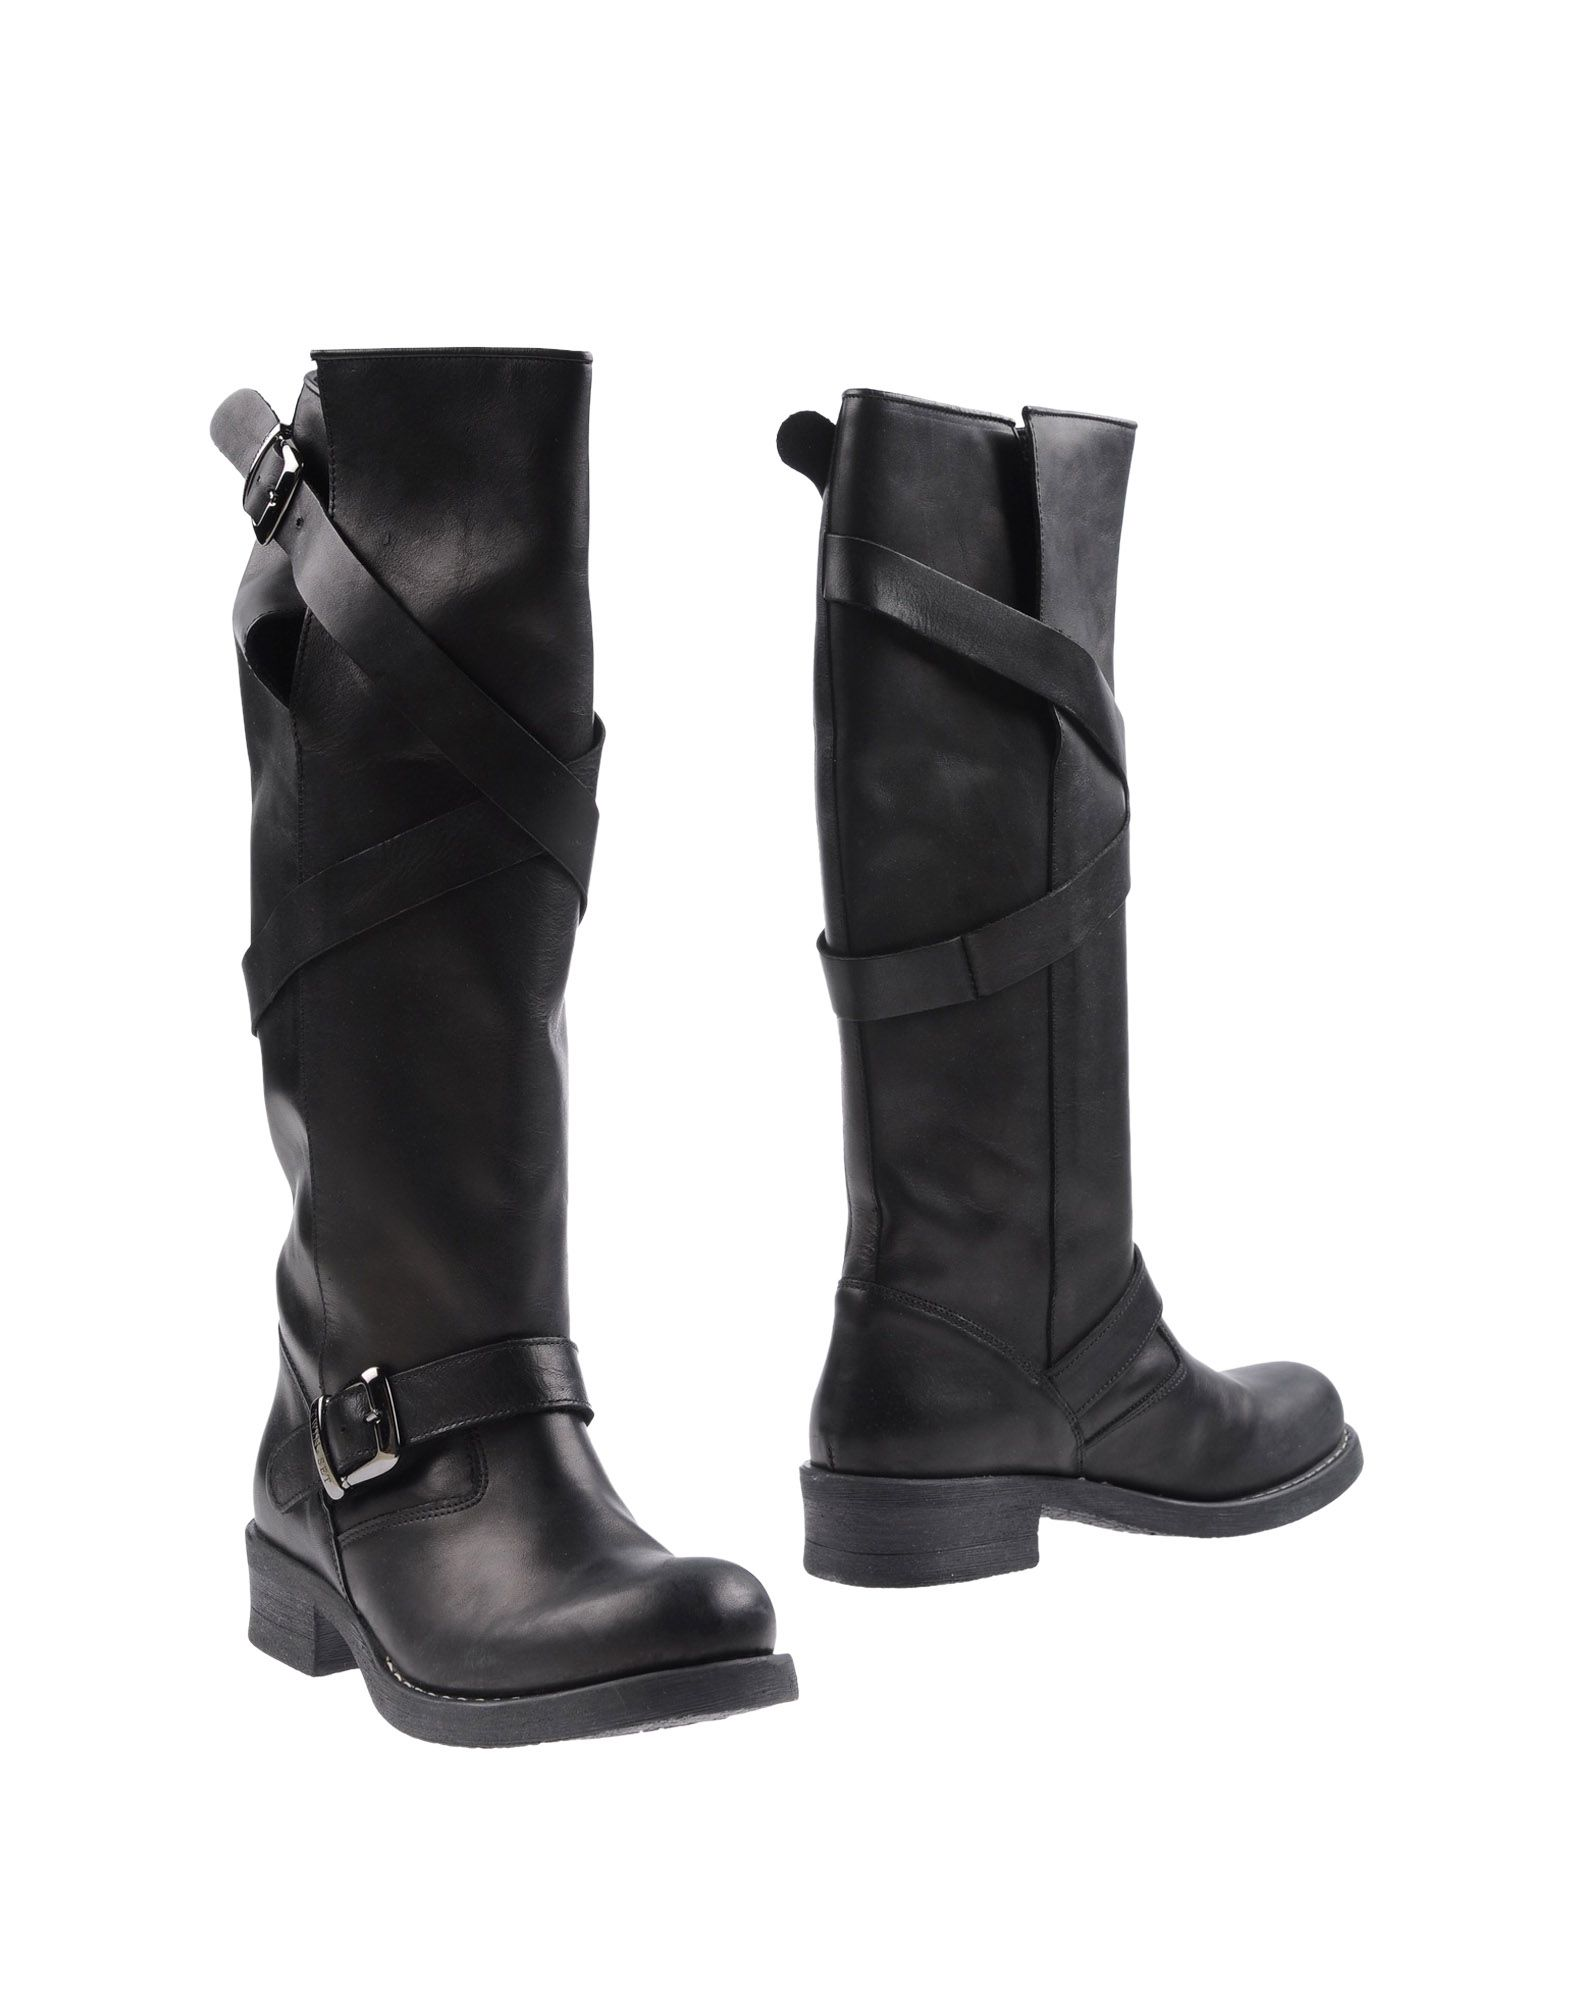 Haltbare Mode billige Schuhe Schuhe Twin 11148378LX Beliebte Schuhe billige 6cb41f